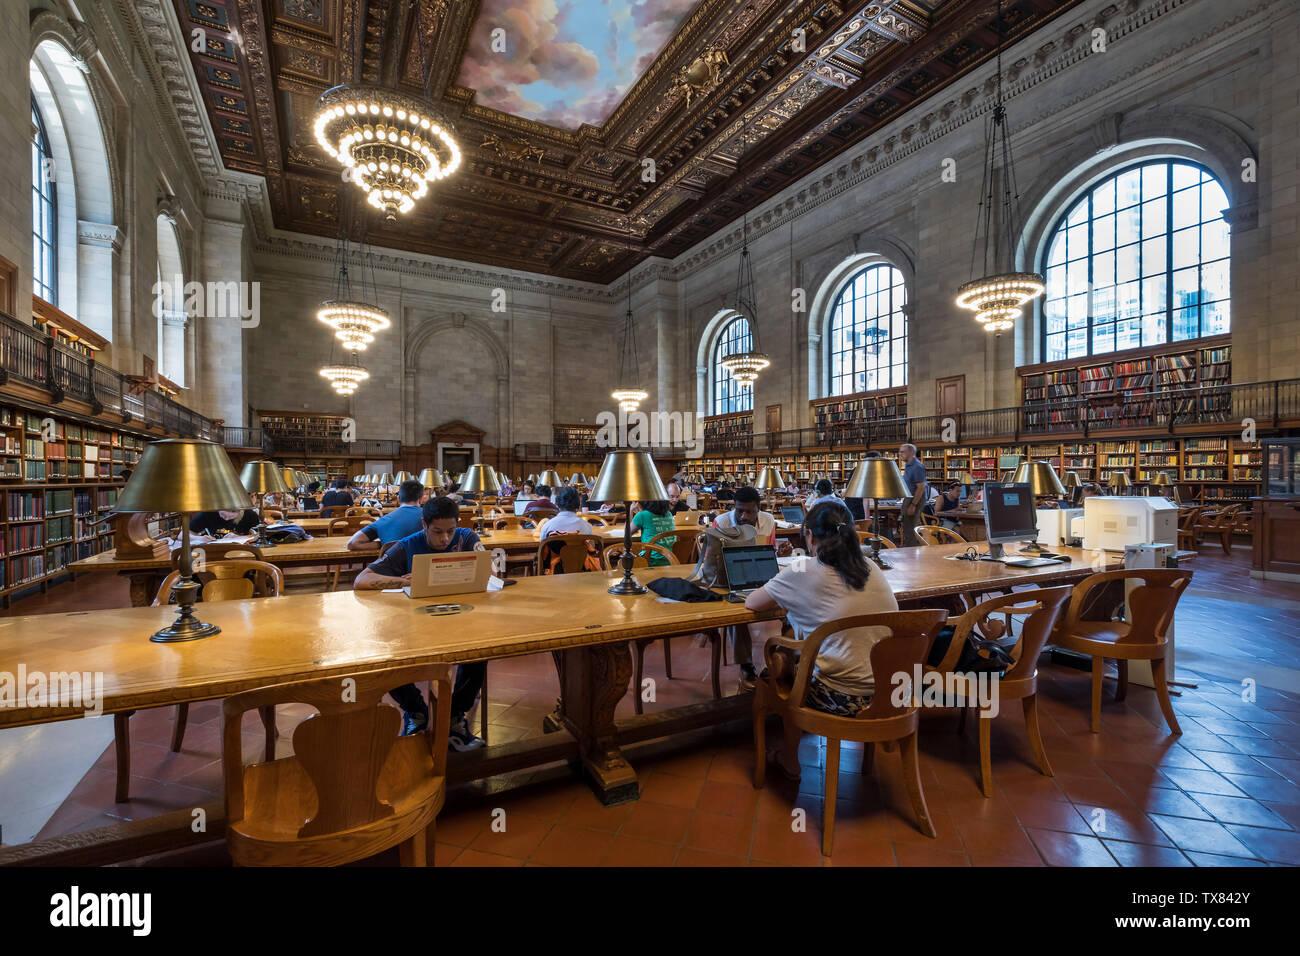 New York Public Library Ceiling Stock Photos & New York